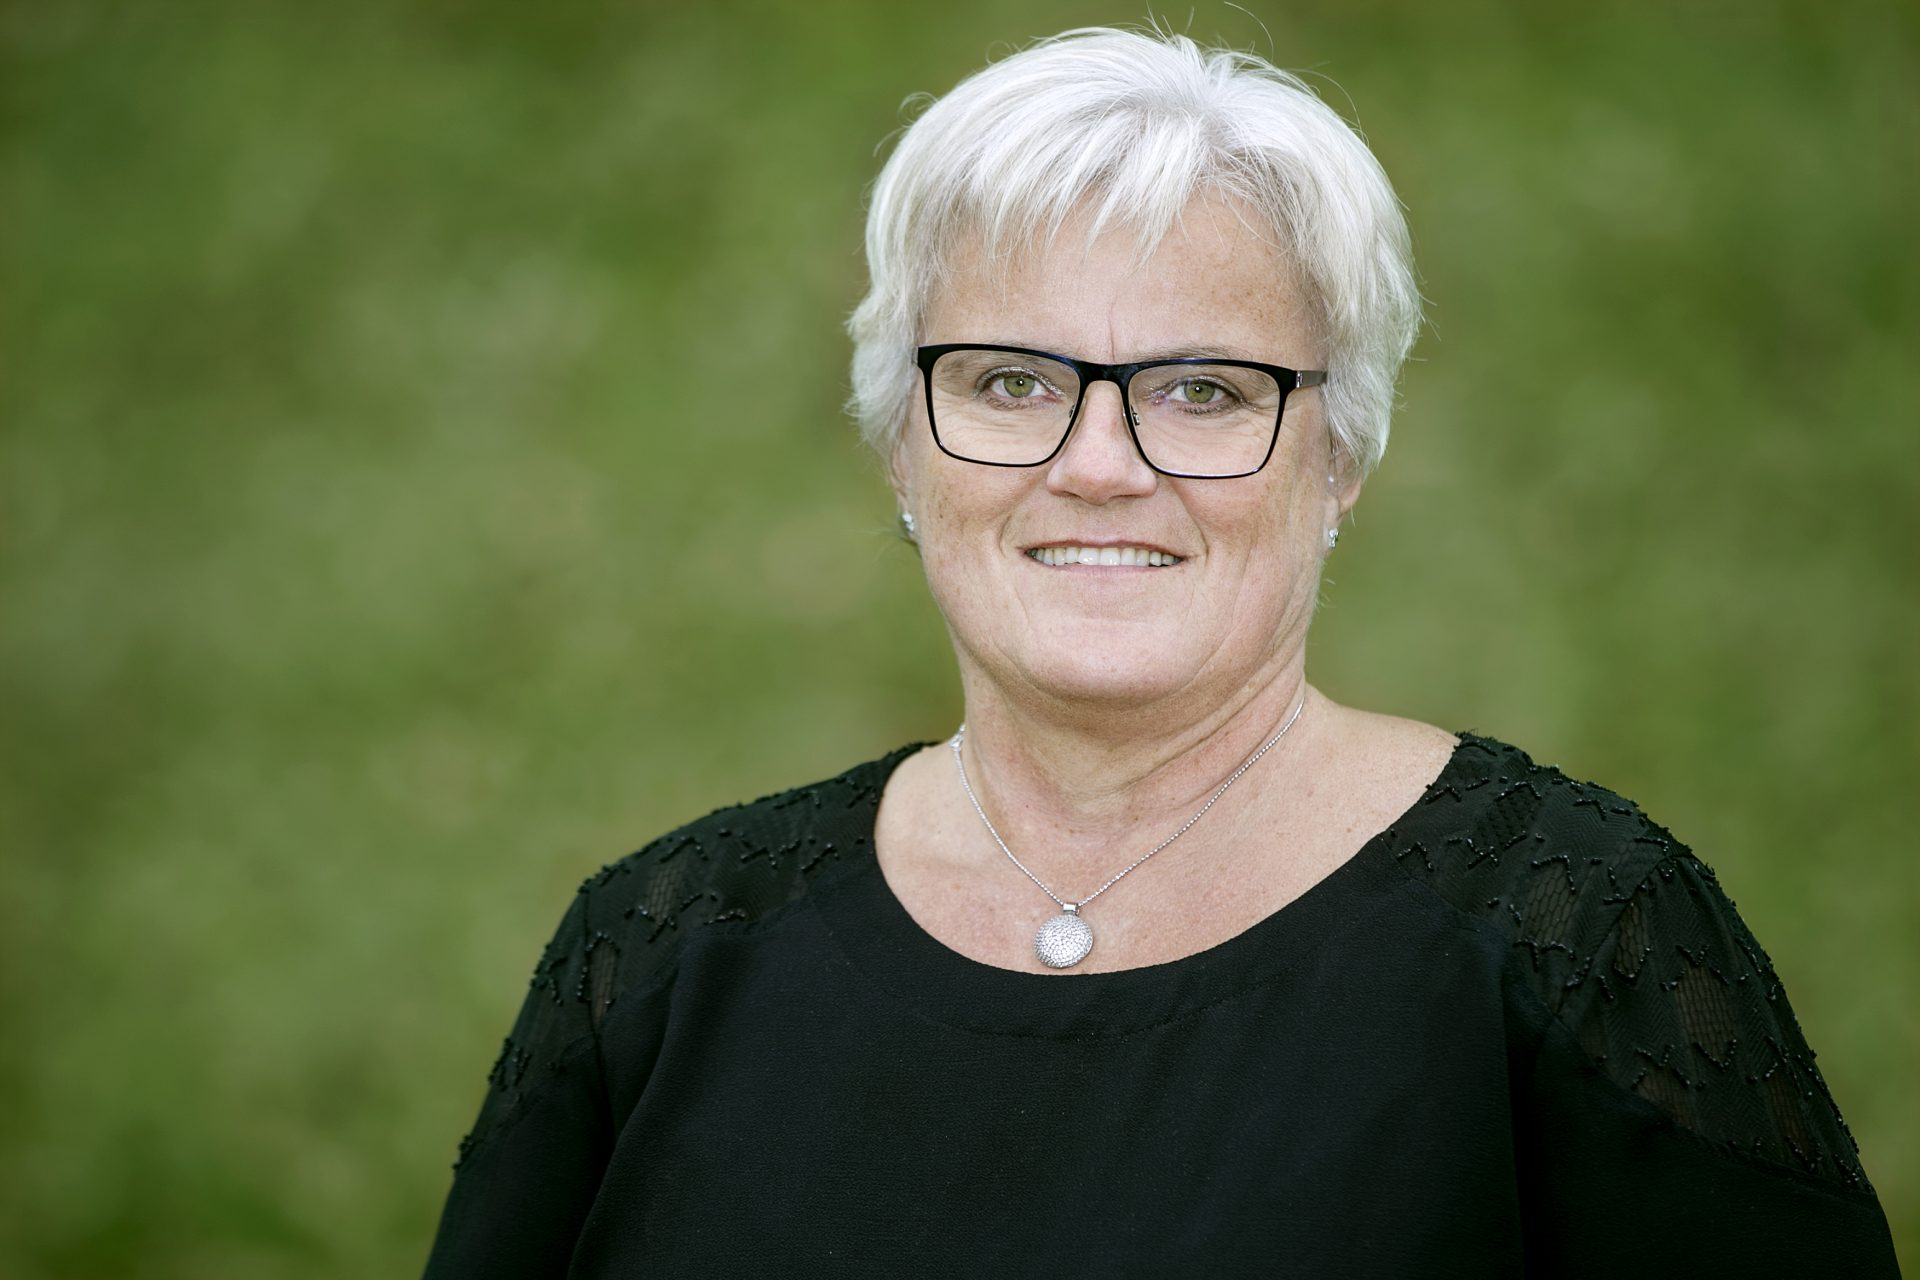 Venstre Horsens Birthe Knudsen